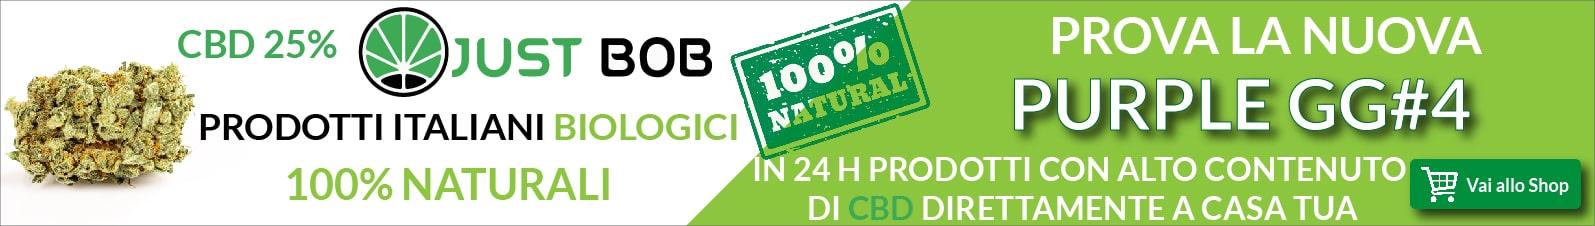 Cannabis legale Purple GG#4 CBD